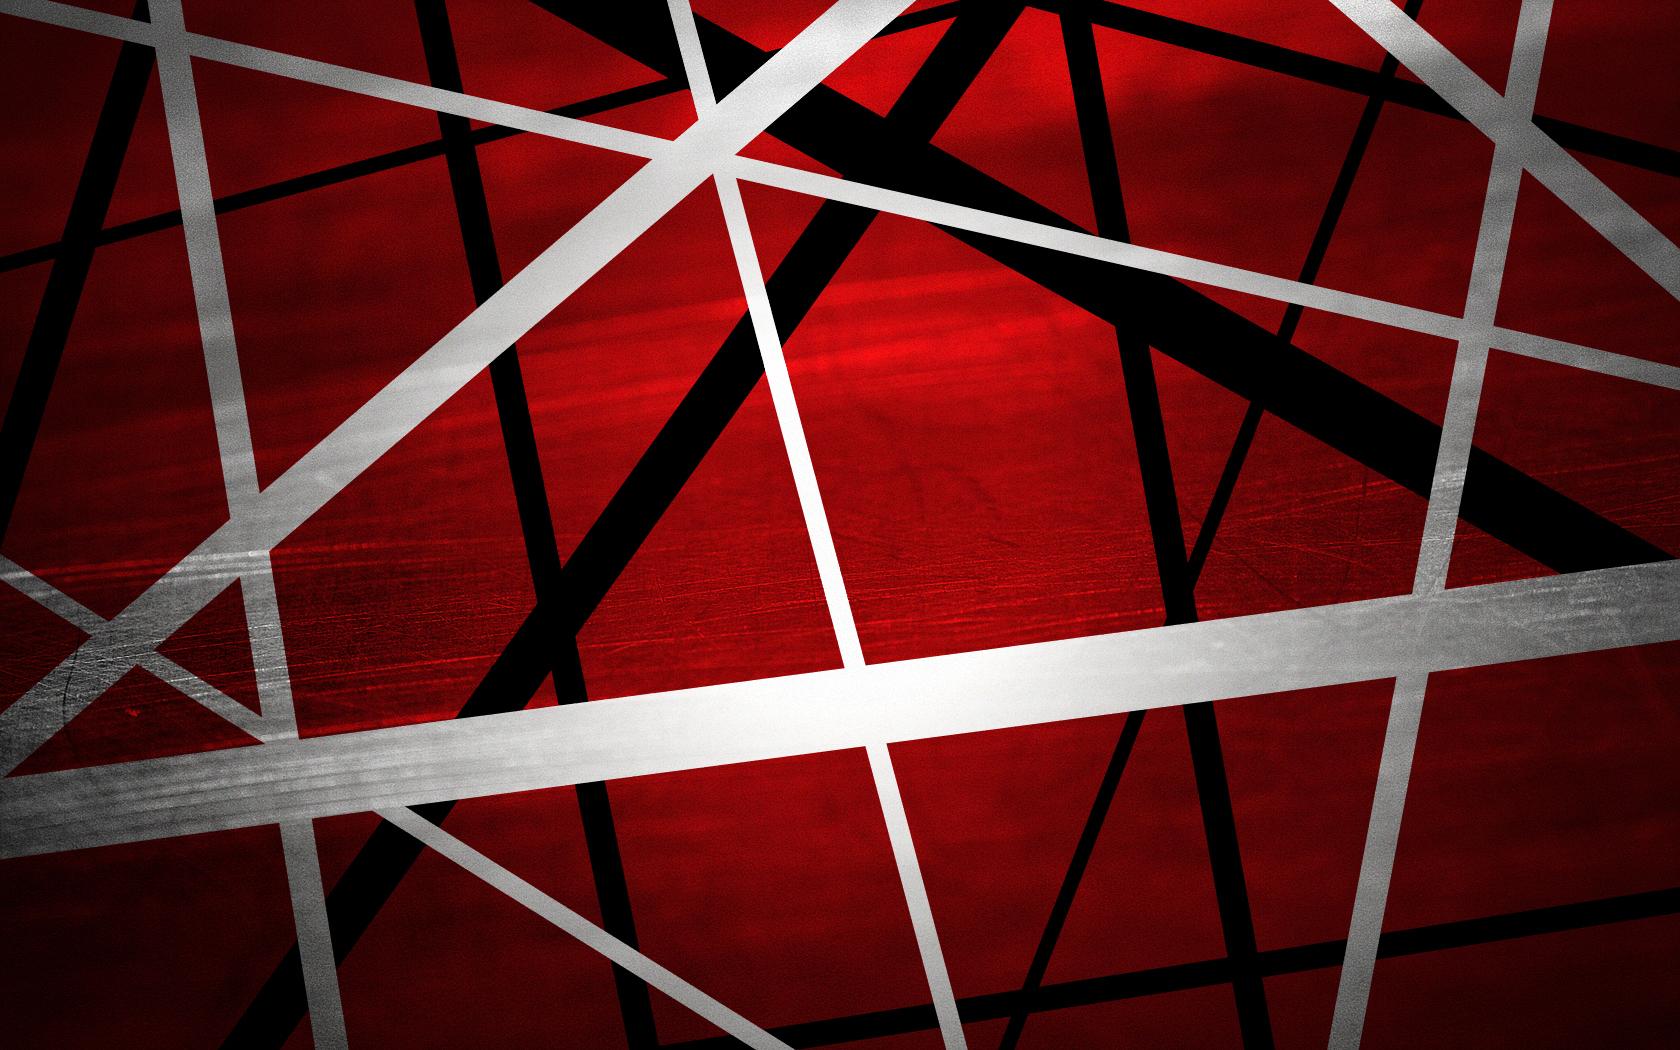 f51df1a60d7 Van Halen Stripes by JohnnySlowhand on DeviantArt